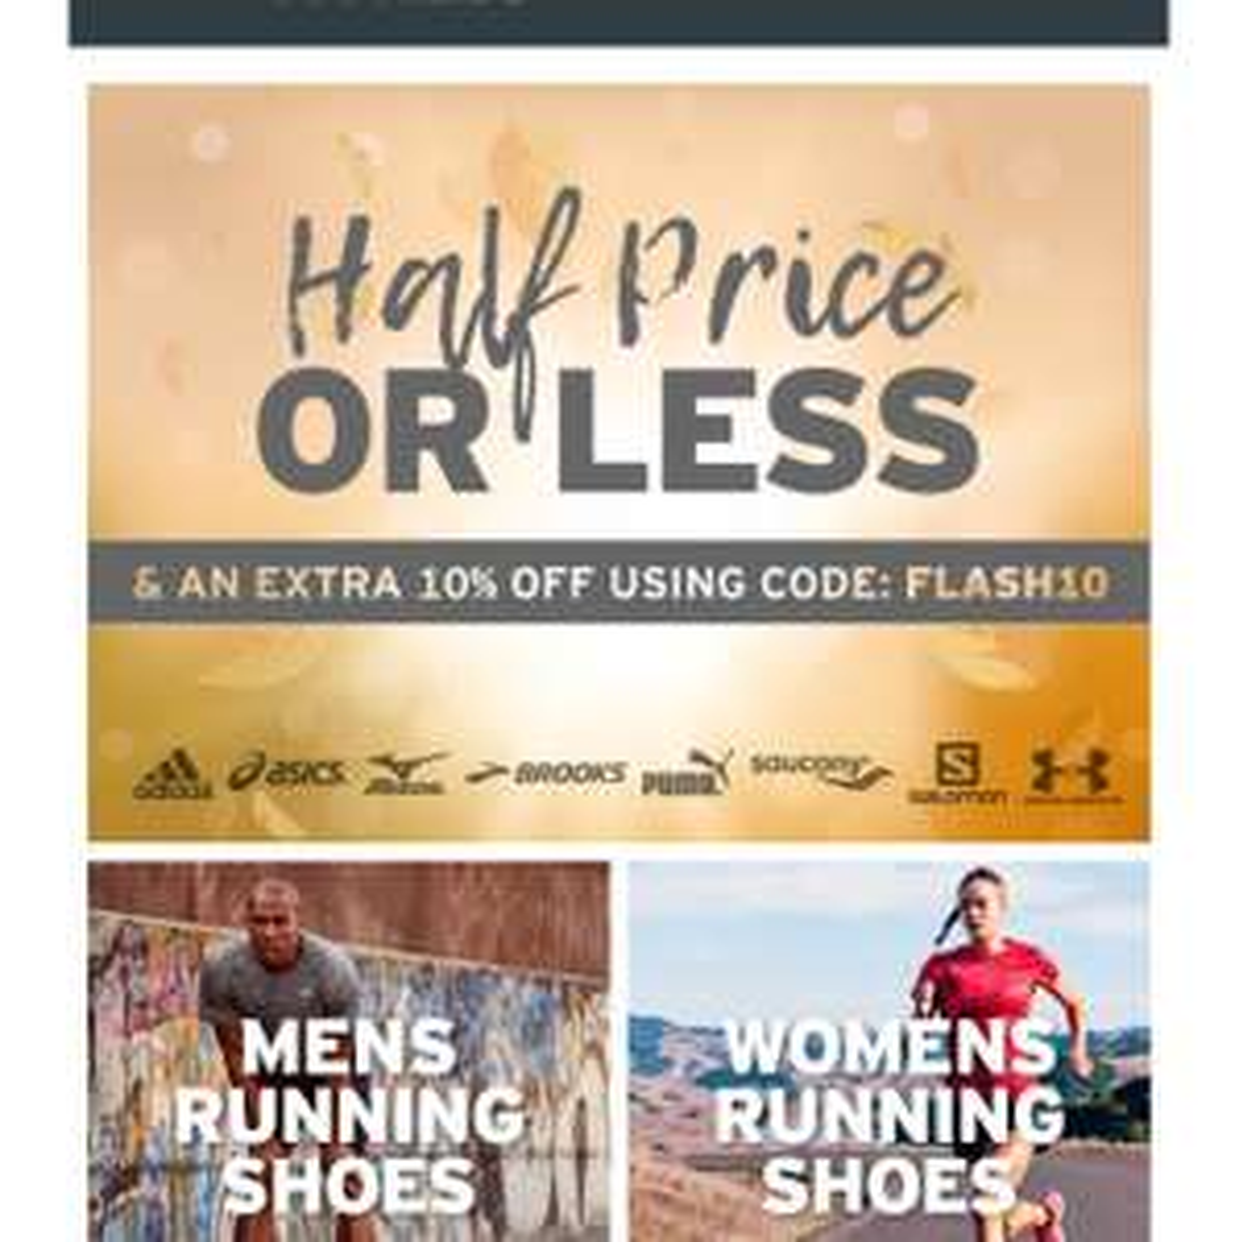 Startfitness 10% off code